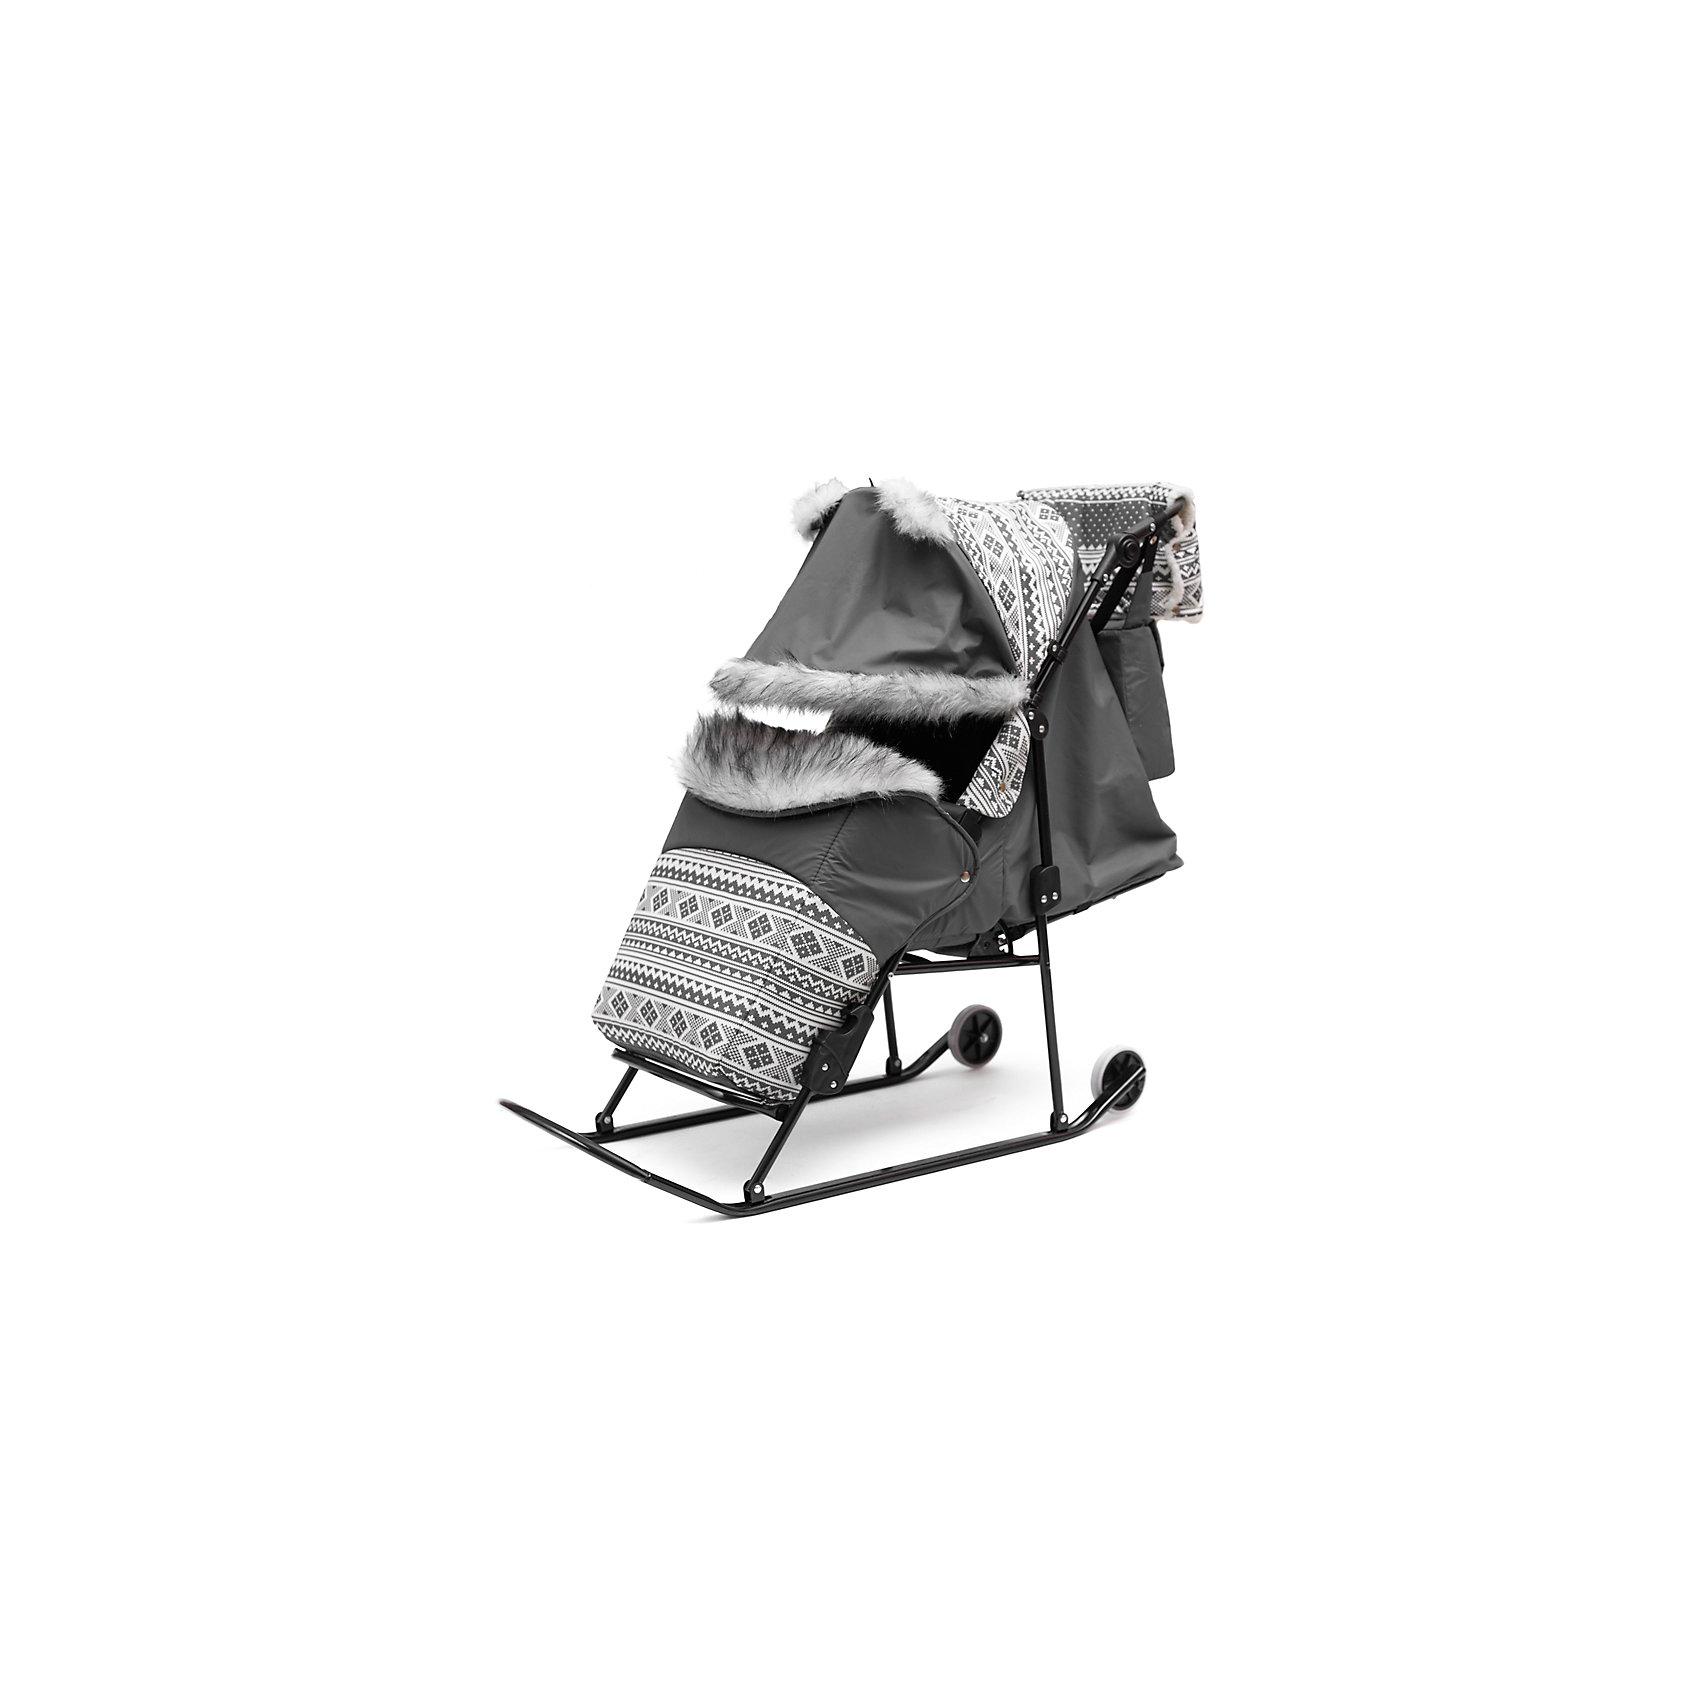 Скандинавия Санки-коляска Скандинавия 2УМ Авто, черная рама, ABC Academy, серый санки коляска abc academy скандинавия 1718 blue dark grey